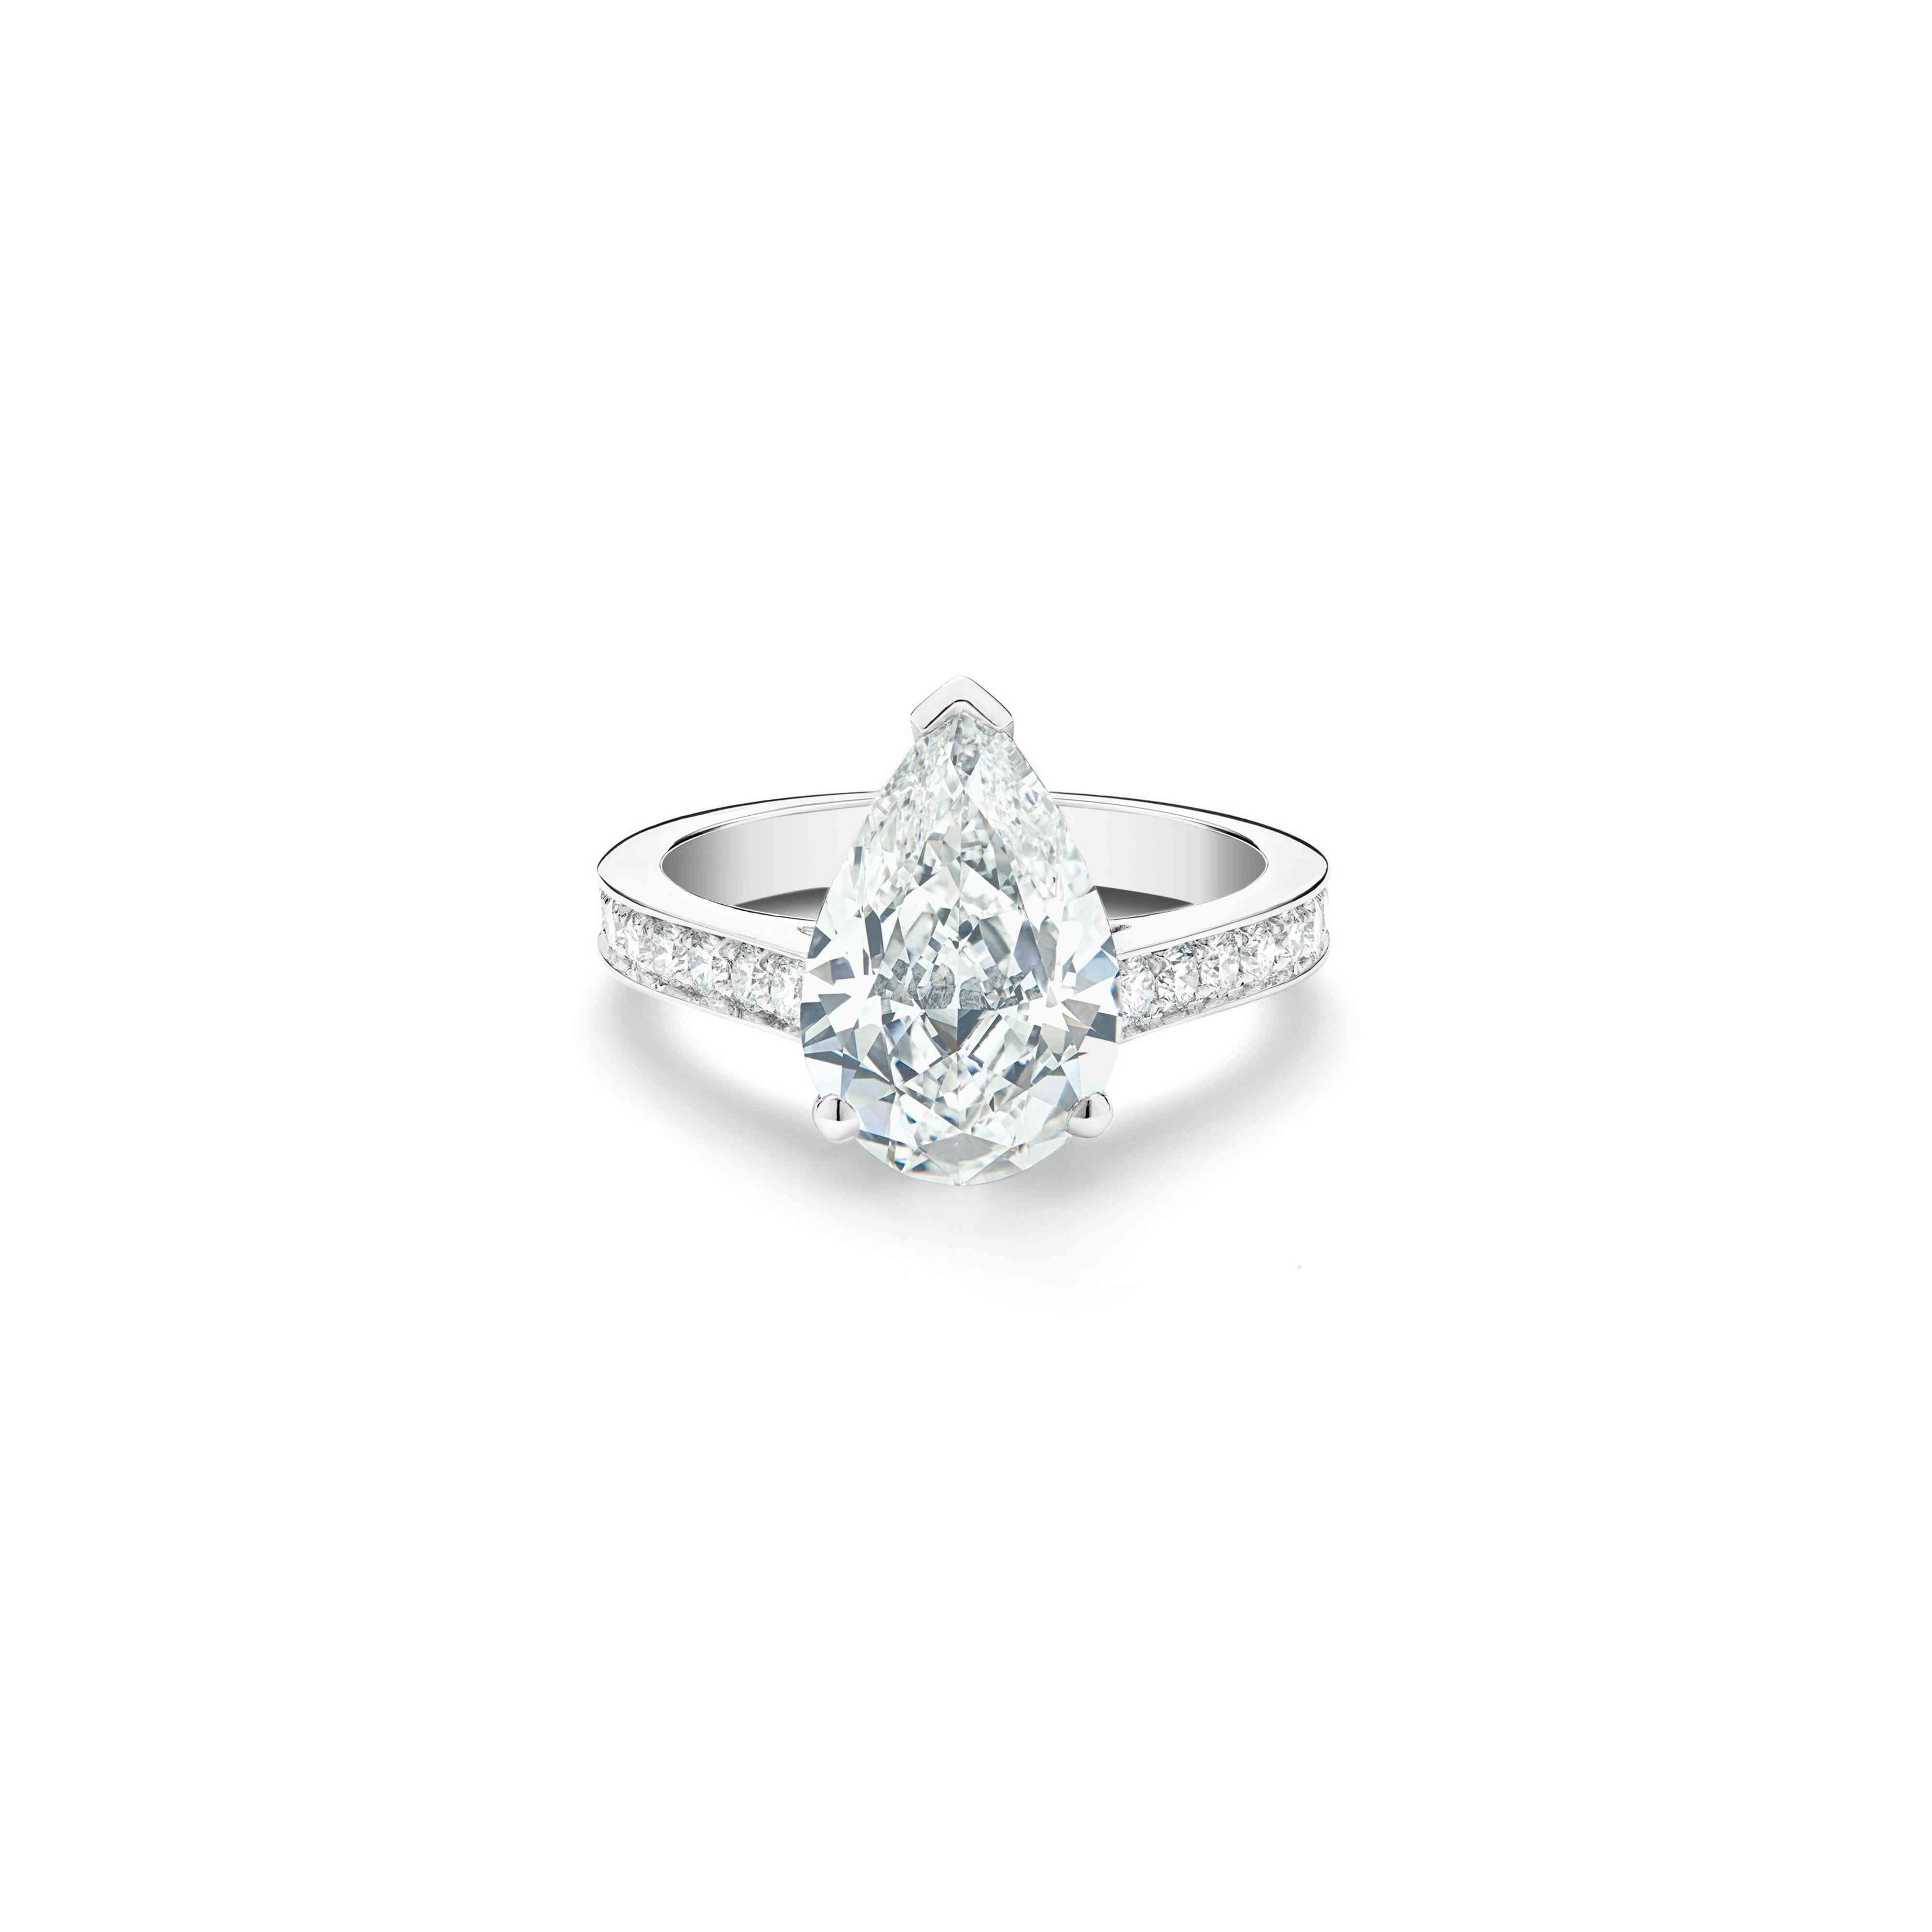 De Beers Old Bond Street Pear-Shaped Diamond Ring